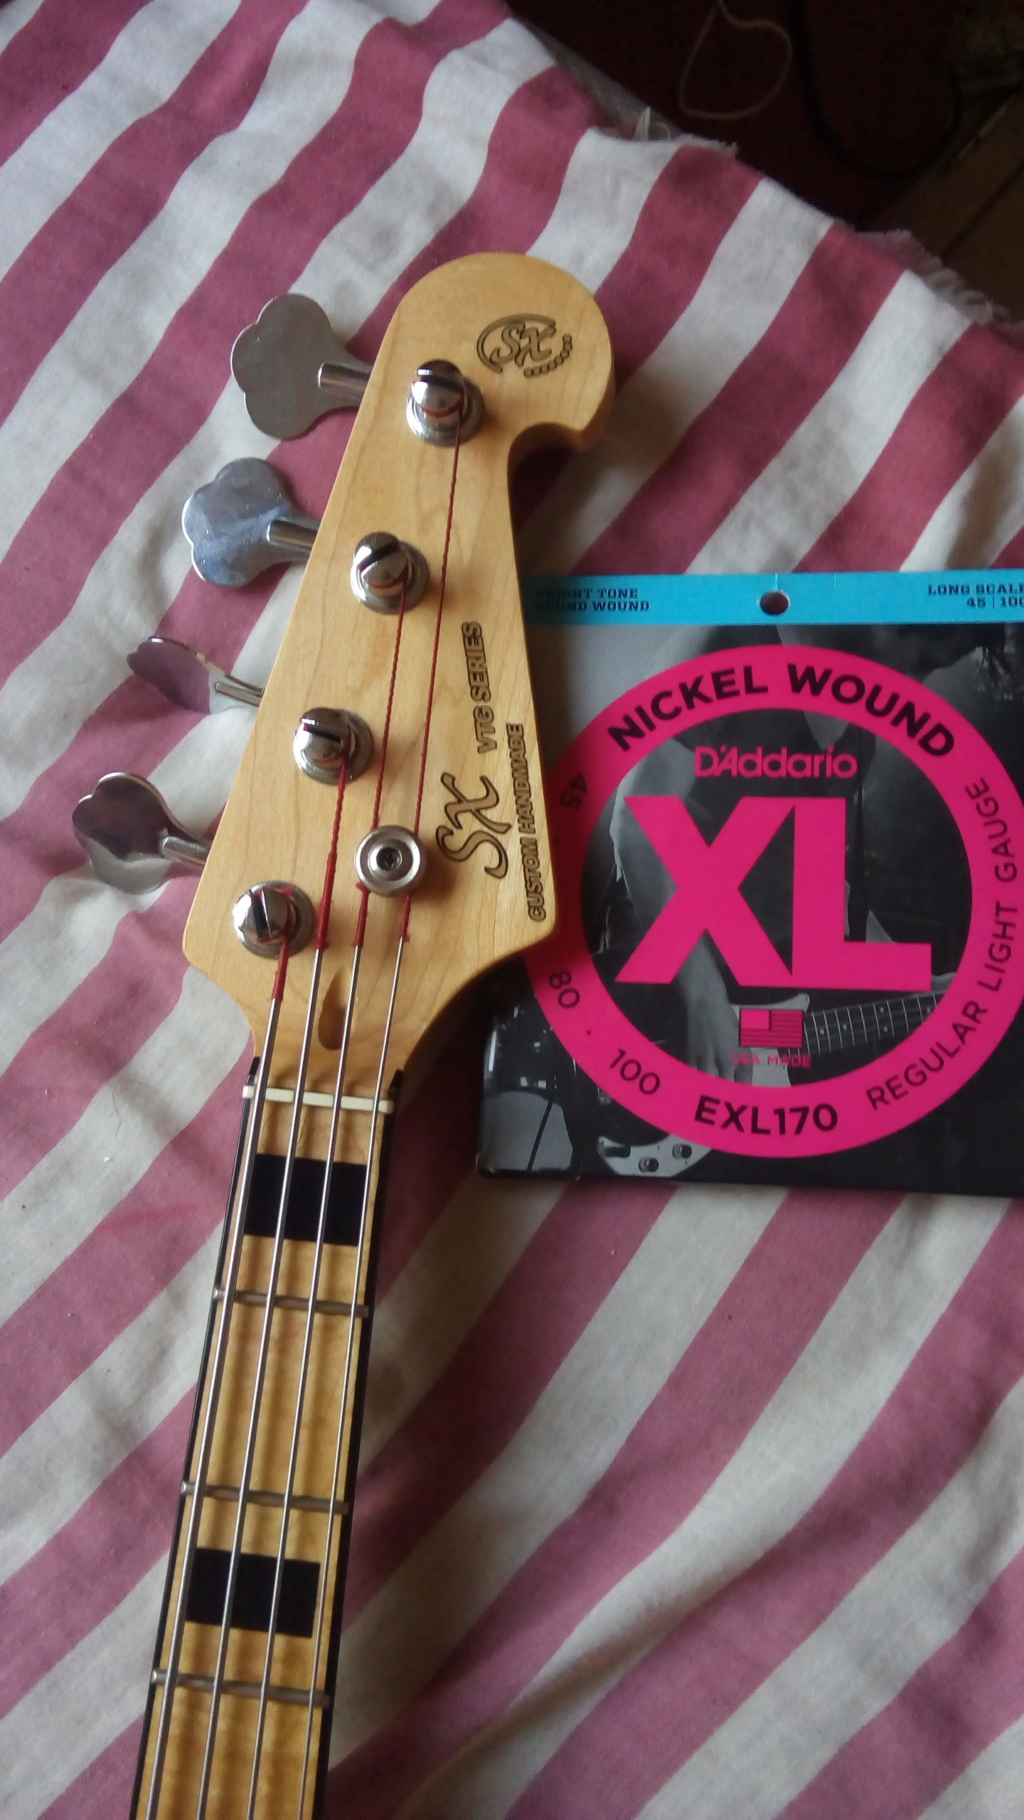 SX Sjb75 - Jazz Bass - R$1.200,00 - VENDIDO! Img_2016